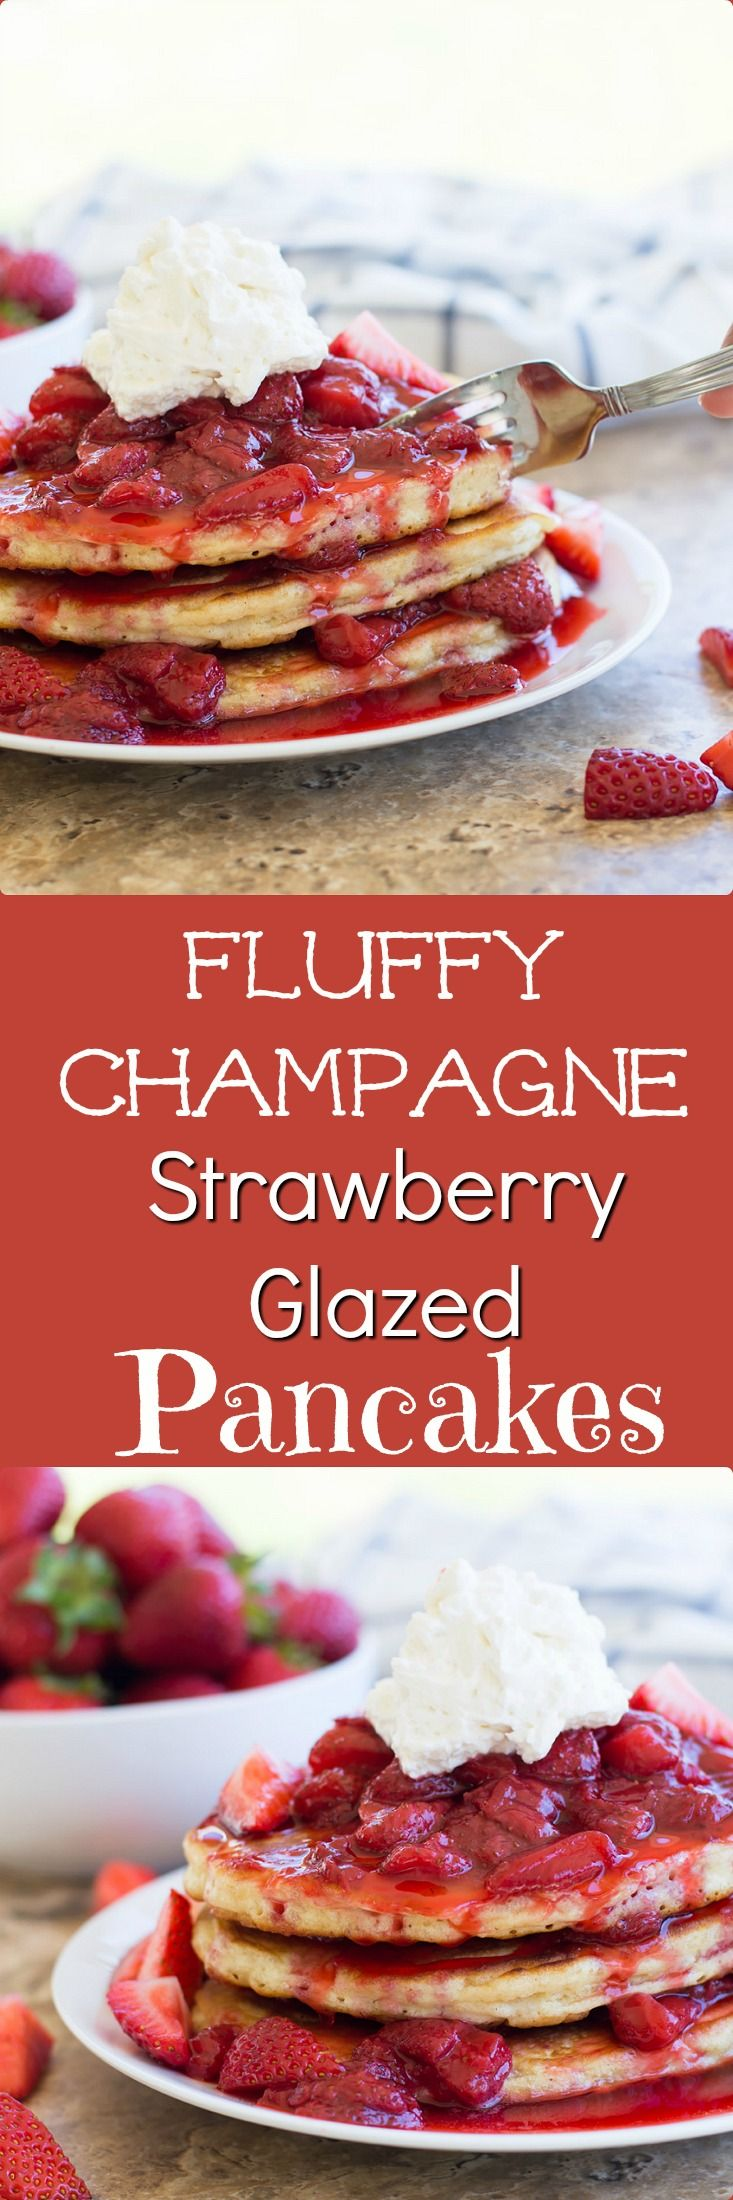 Fluffy Champagne Strawberry Glazed Pancakes